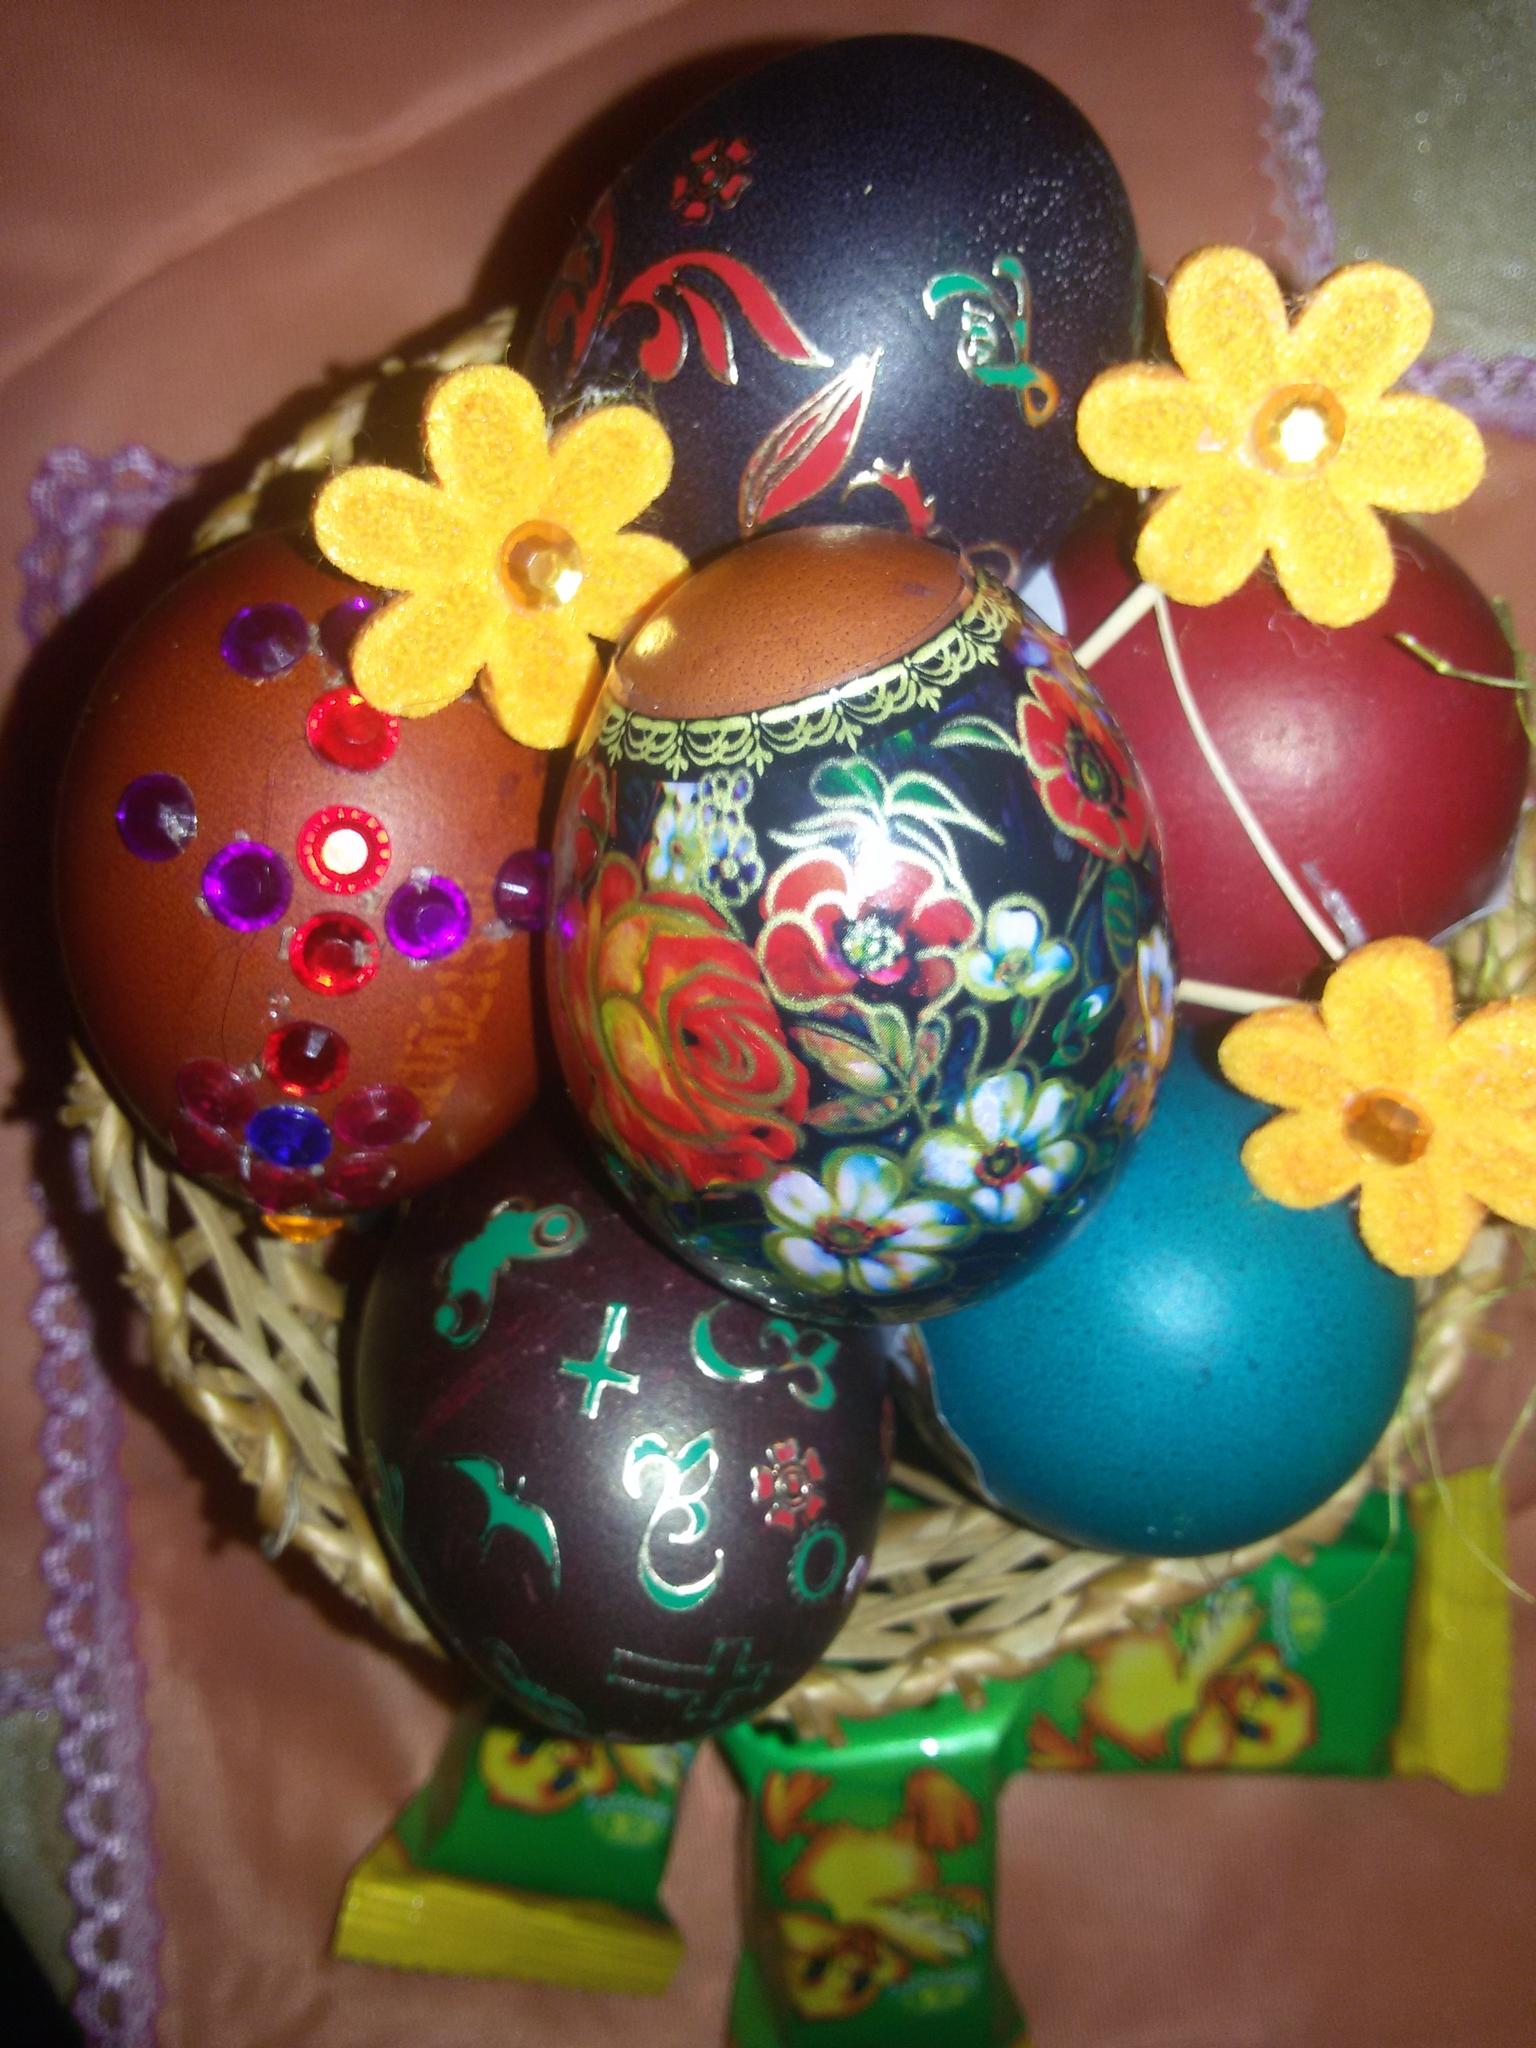 Easter eggs by Zita Užkuraitienė